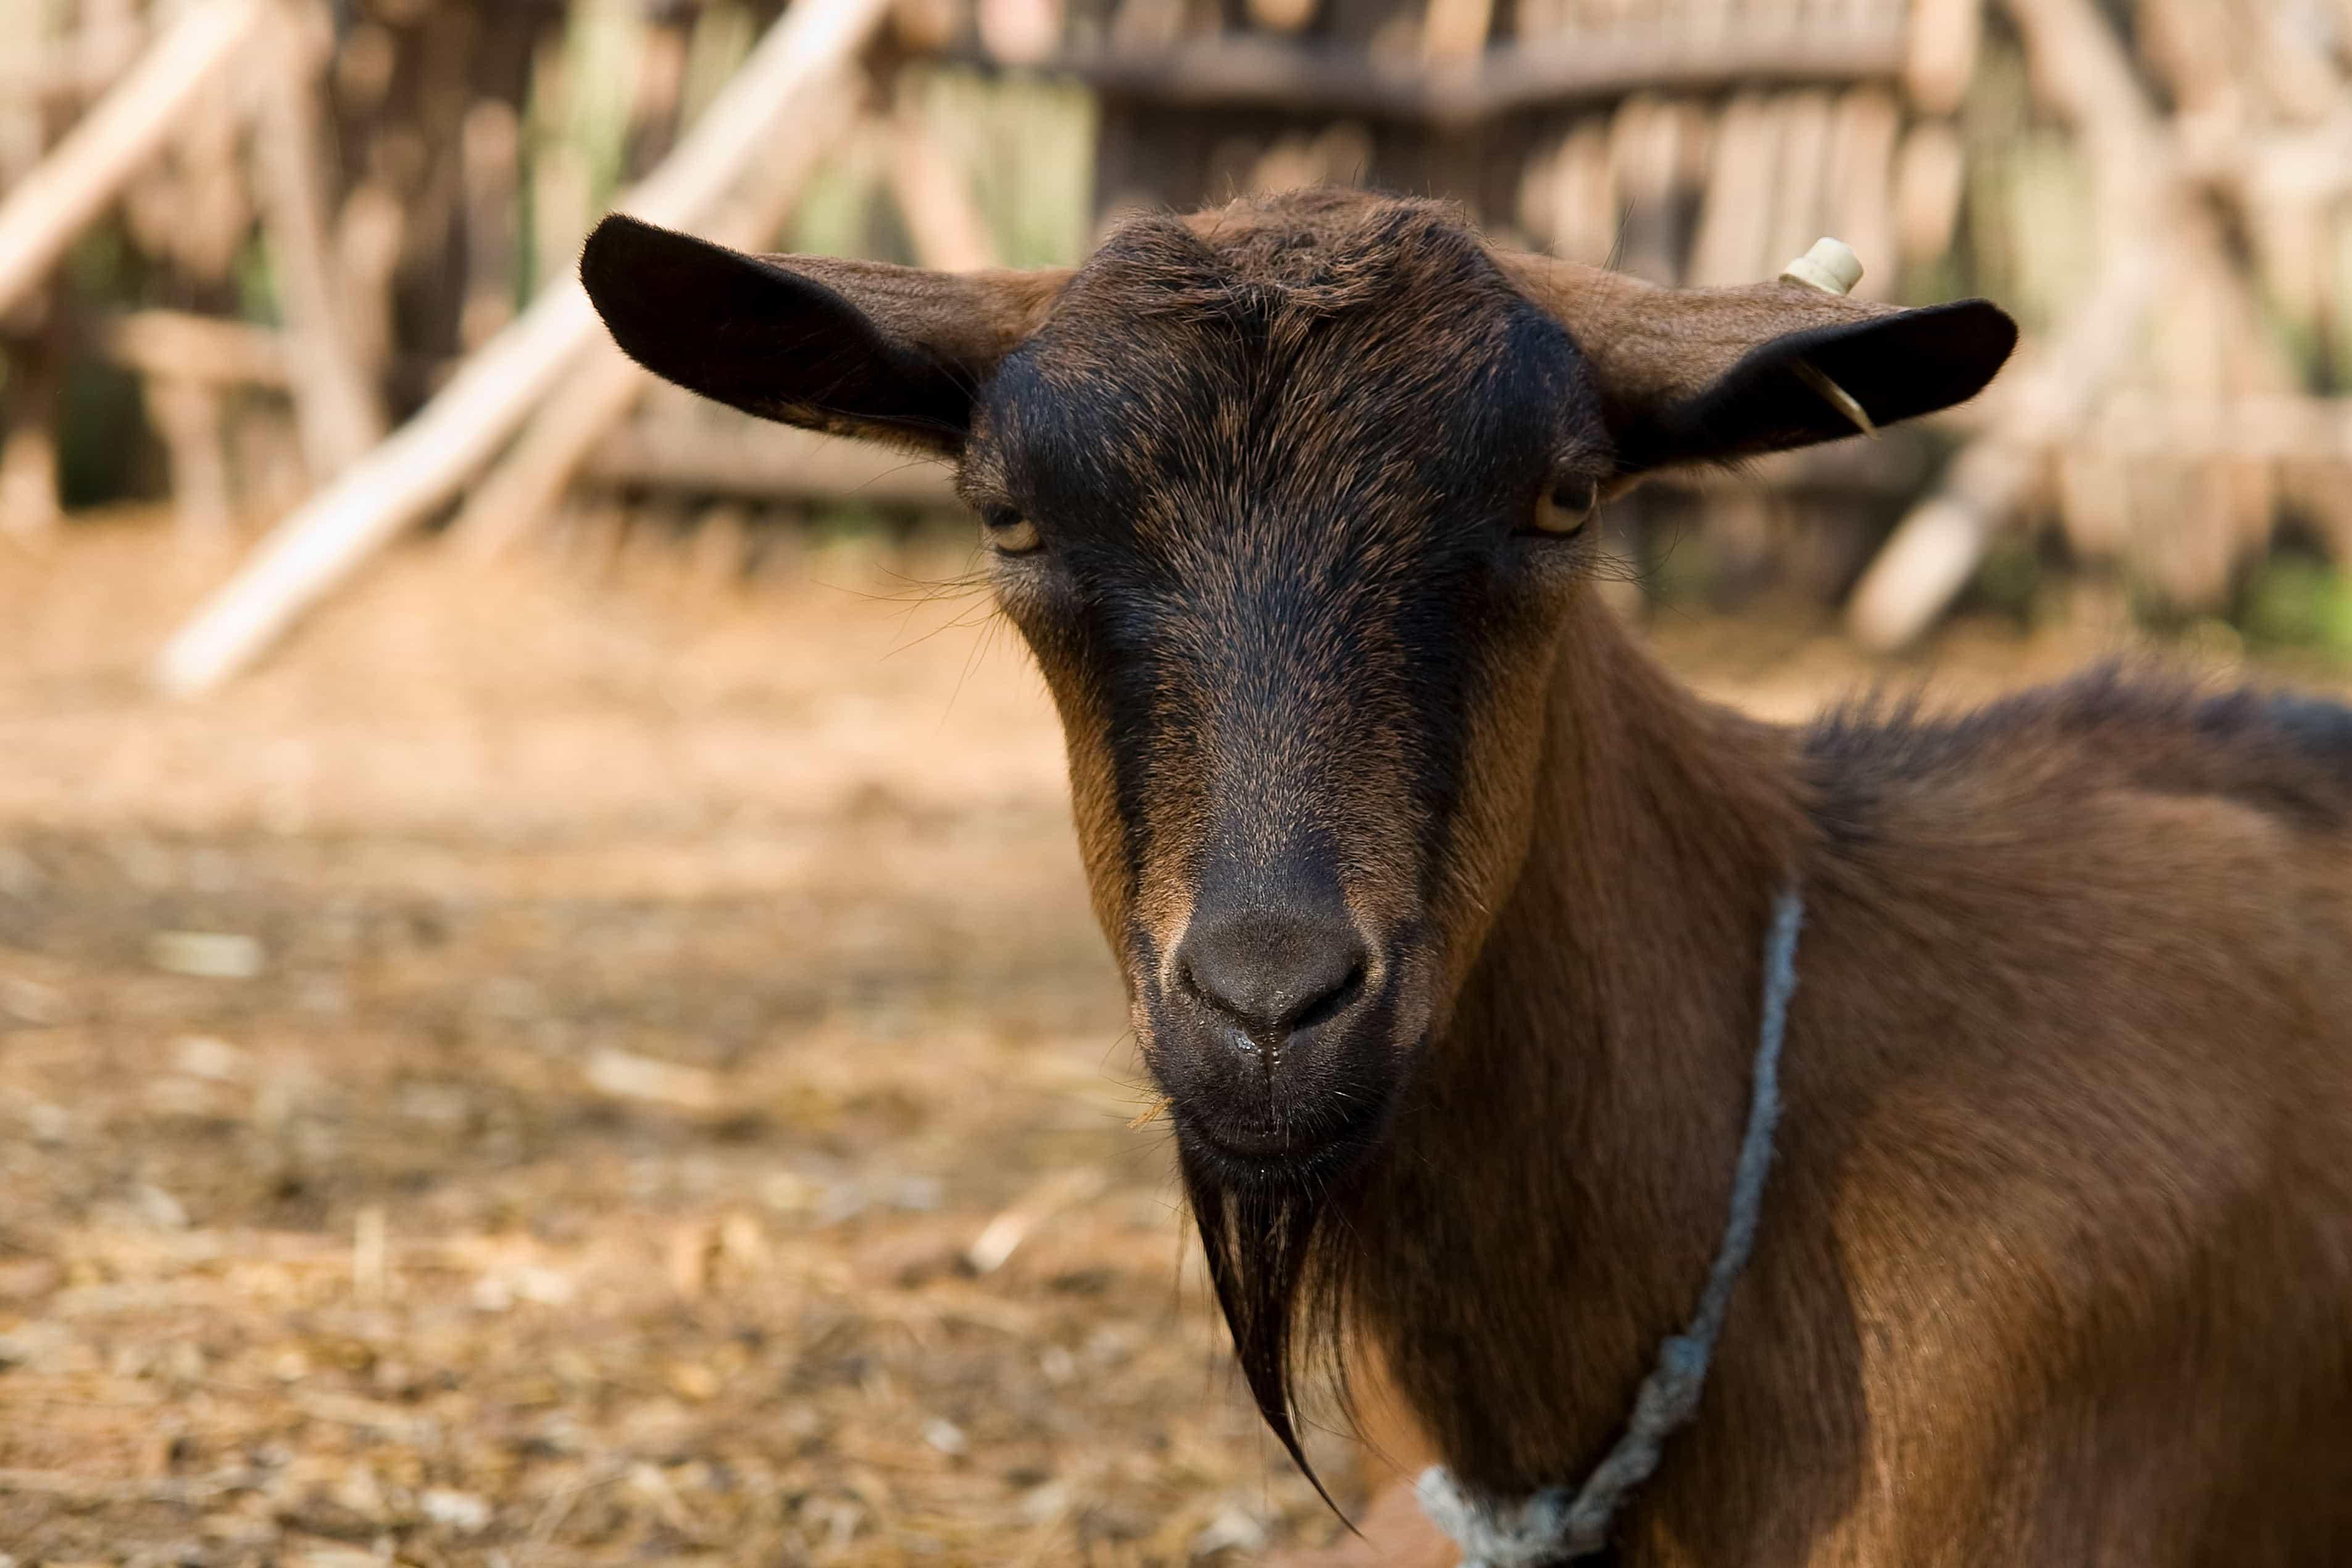 Gambar gratis: hewan, kambing outdoor, coklat, bulu, hewan